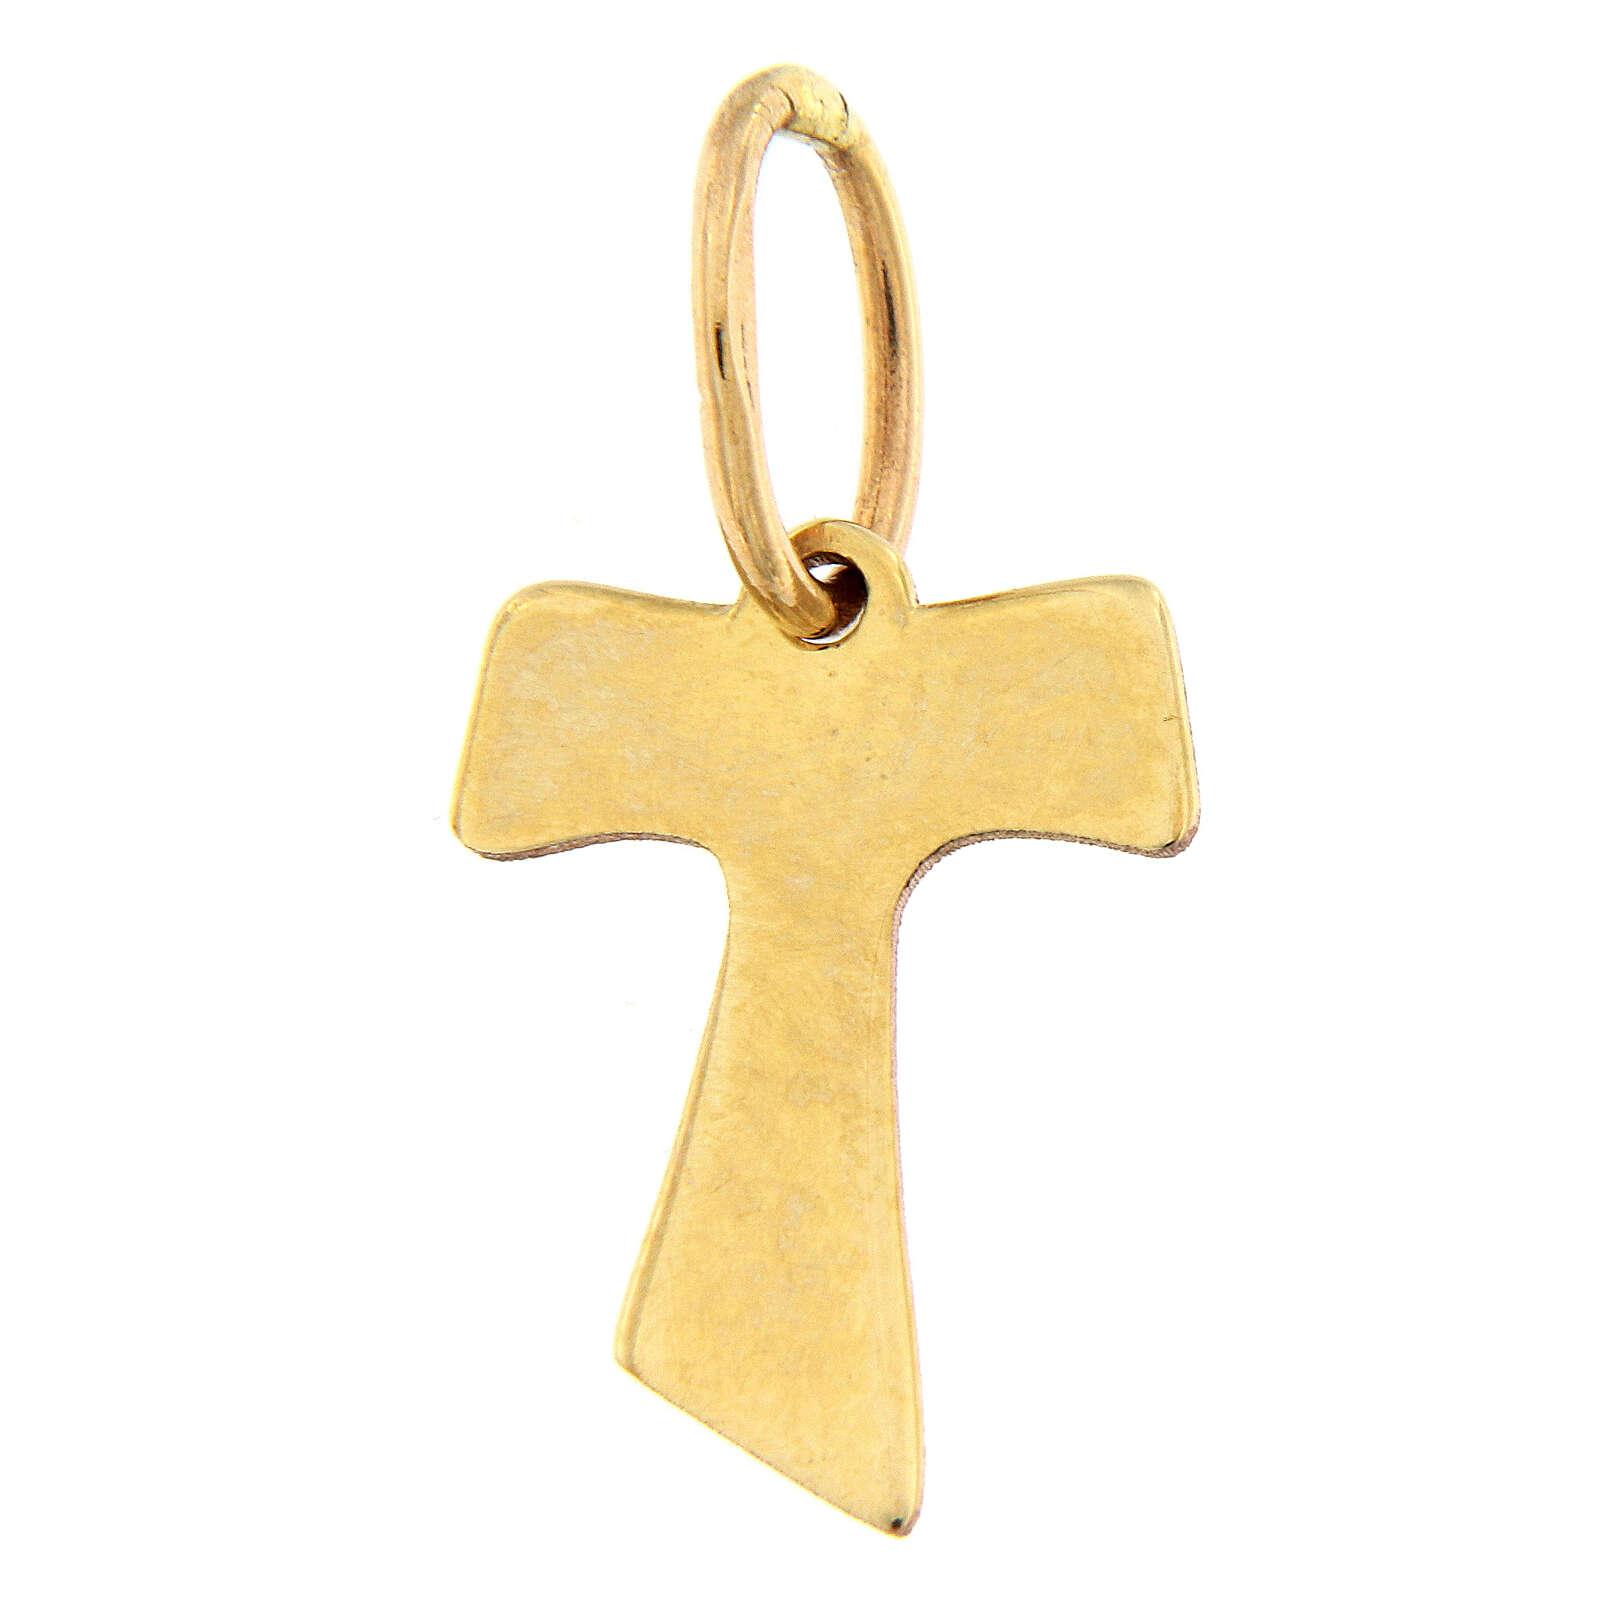 Cruz colgante Tau oro 18 quilates efecto madera 0,2 gr 4